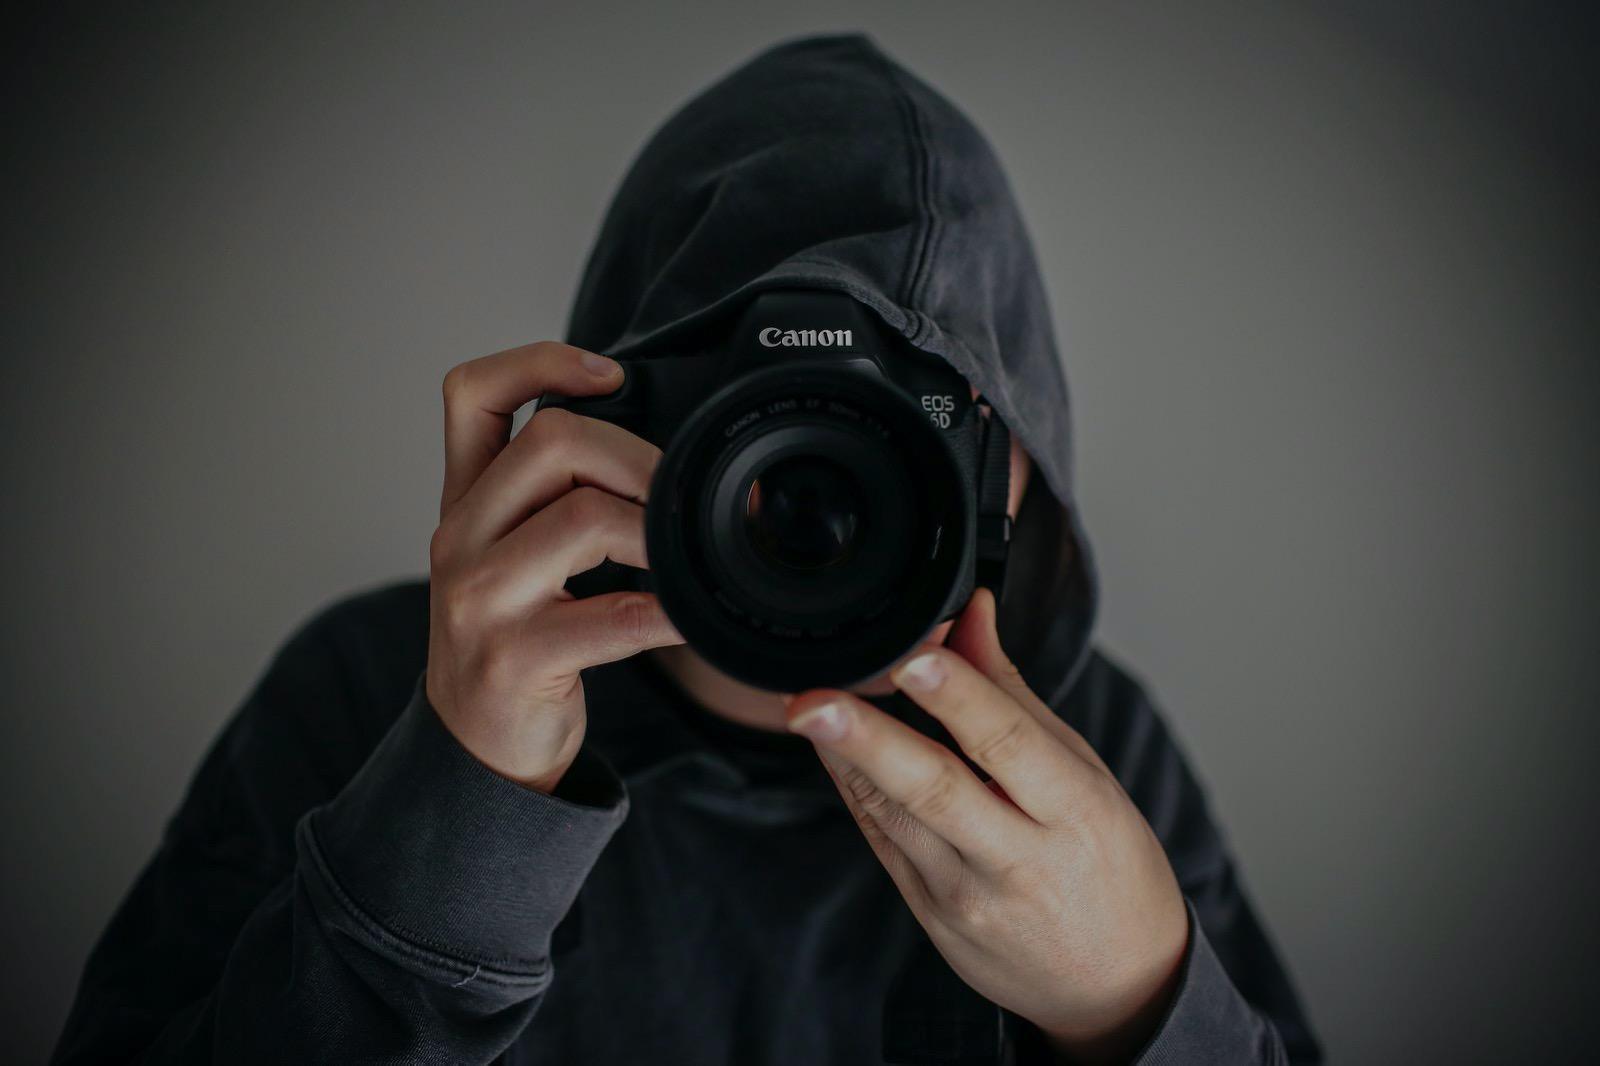 Miss zhang uRyDXomVG94 unsplash camera